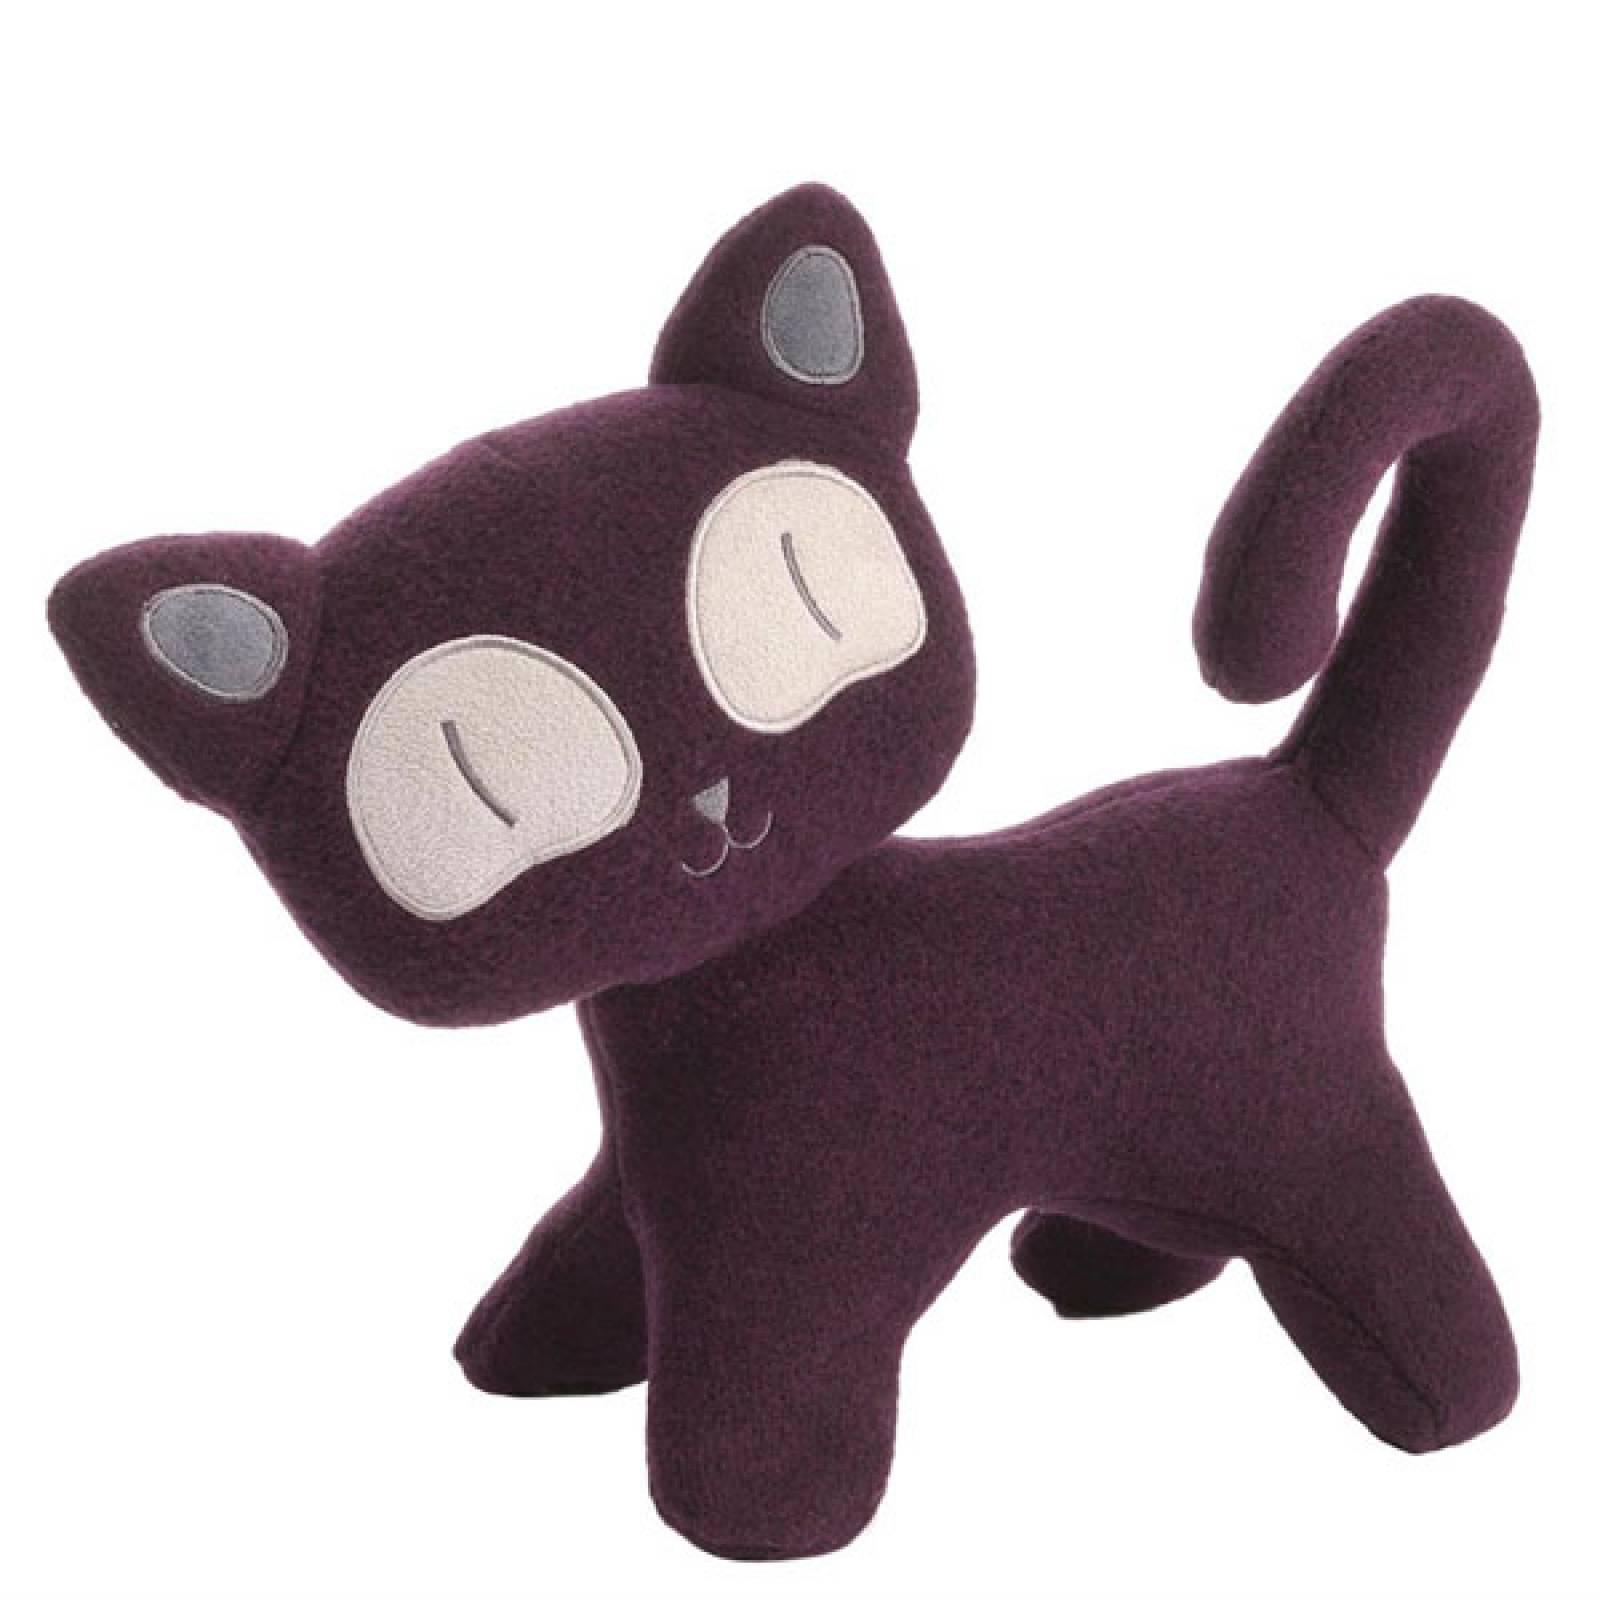 Hasumi Cat Purple Soft Toy 1yr+